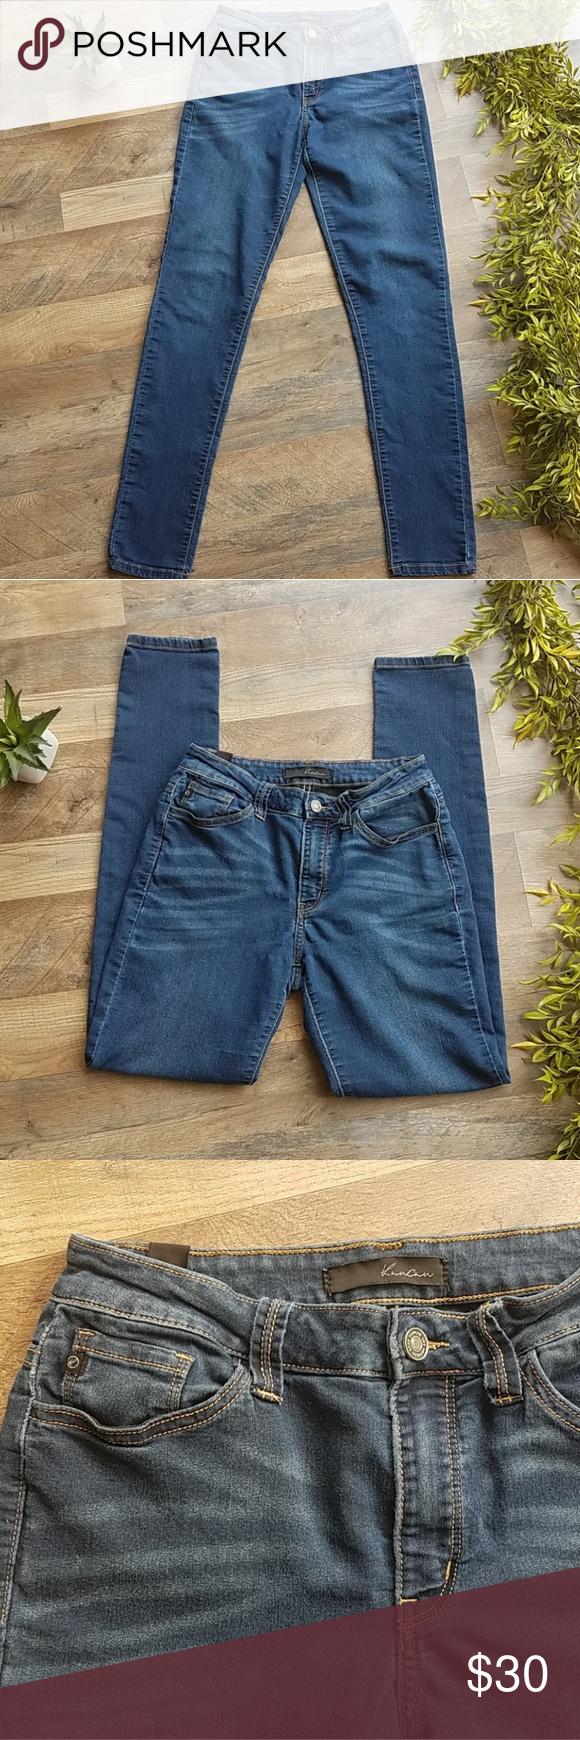 Kancan Estilo Skinny Jeans Clothes Design Fashion Design Fashion Tips